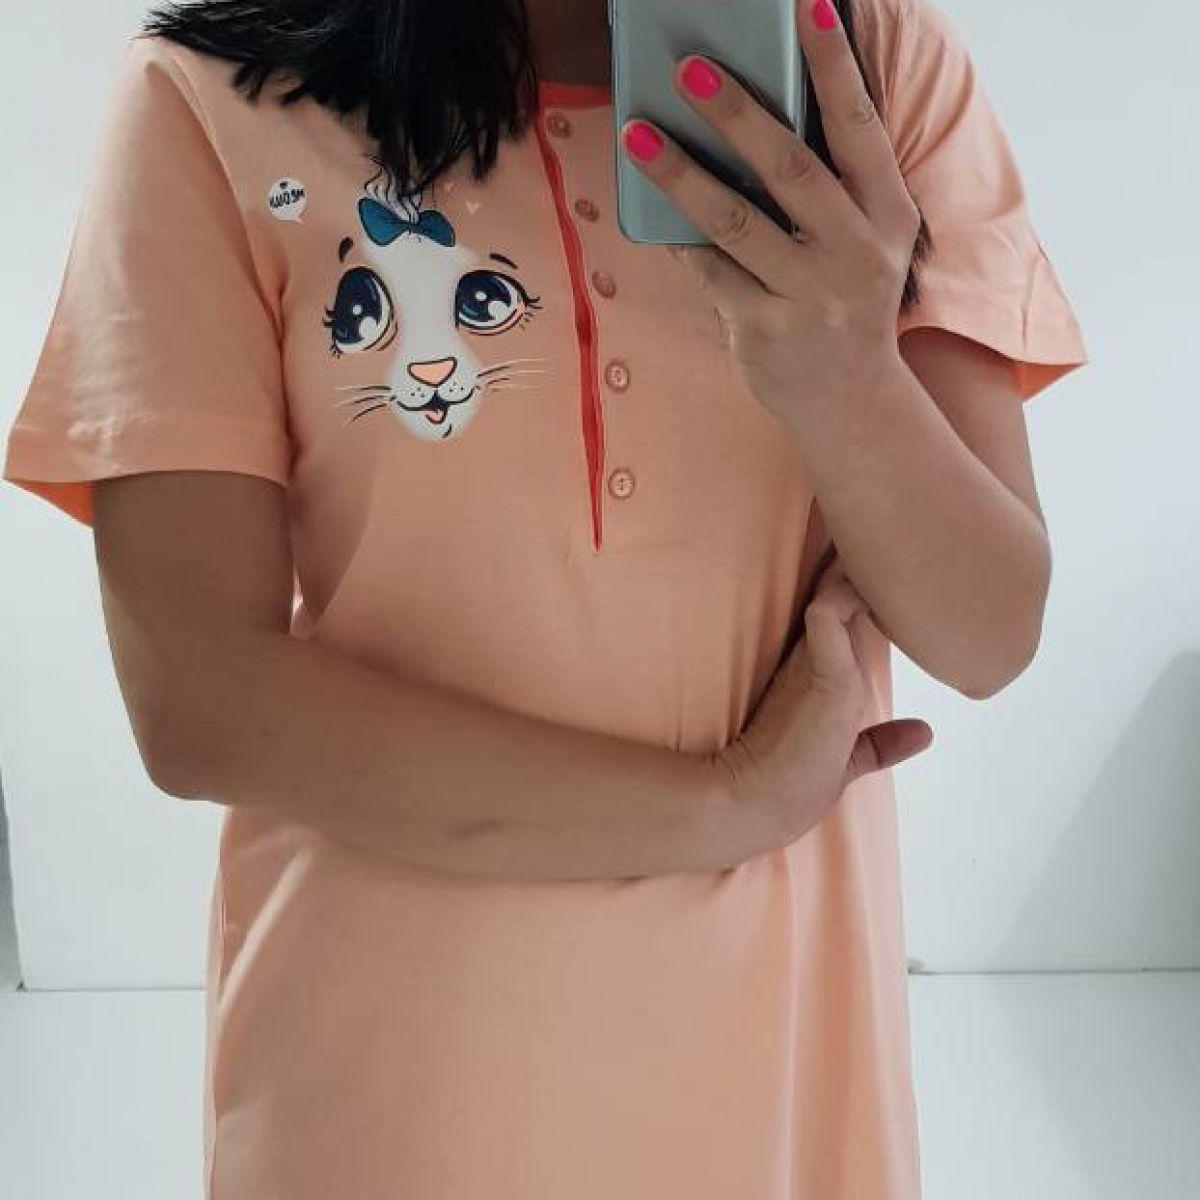 Nightgown BENTER - 65688